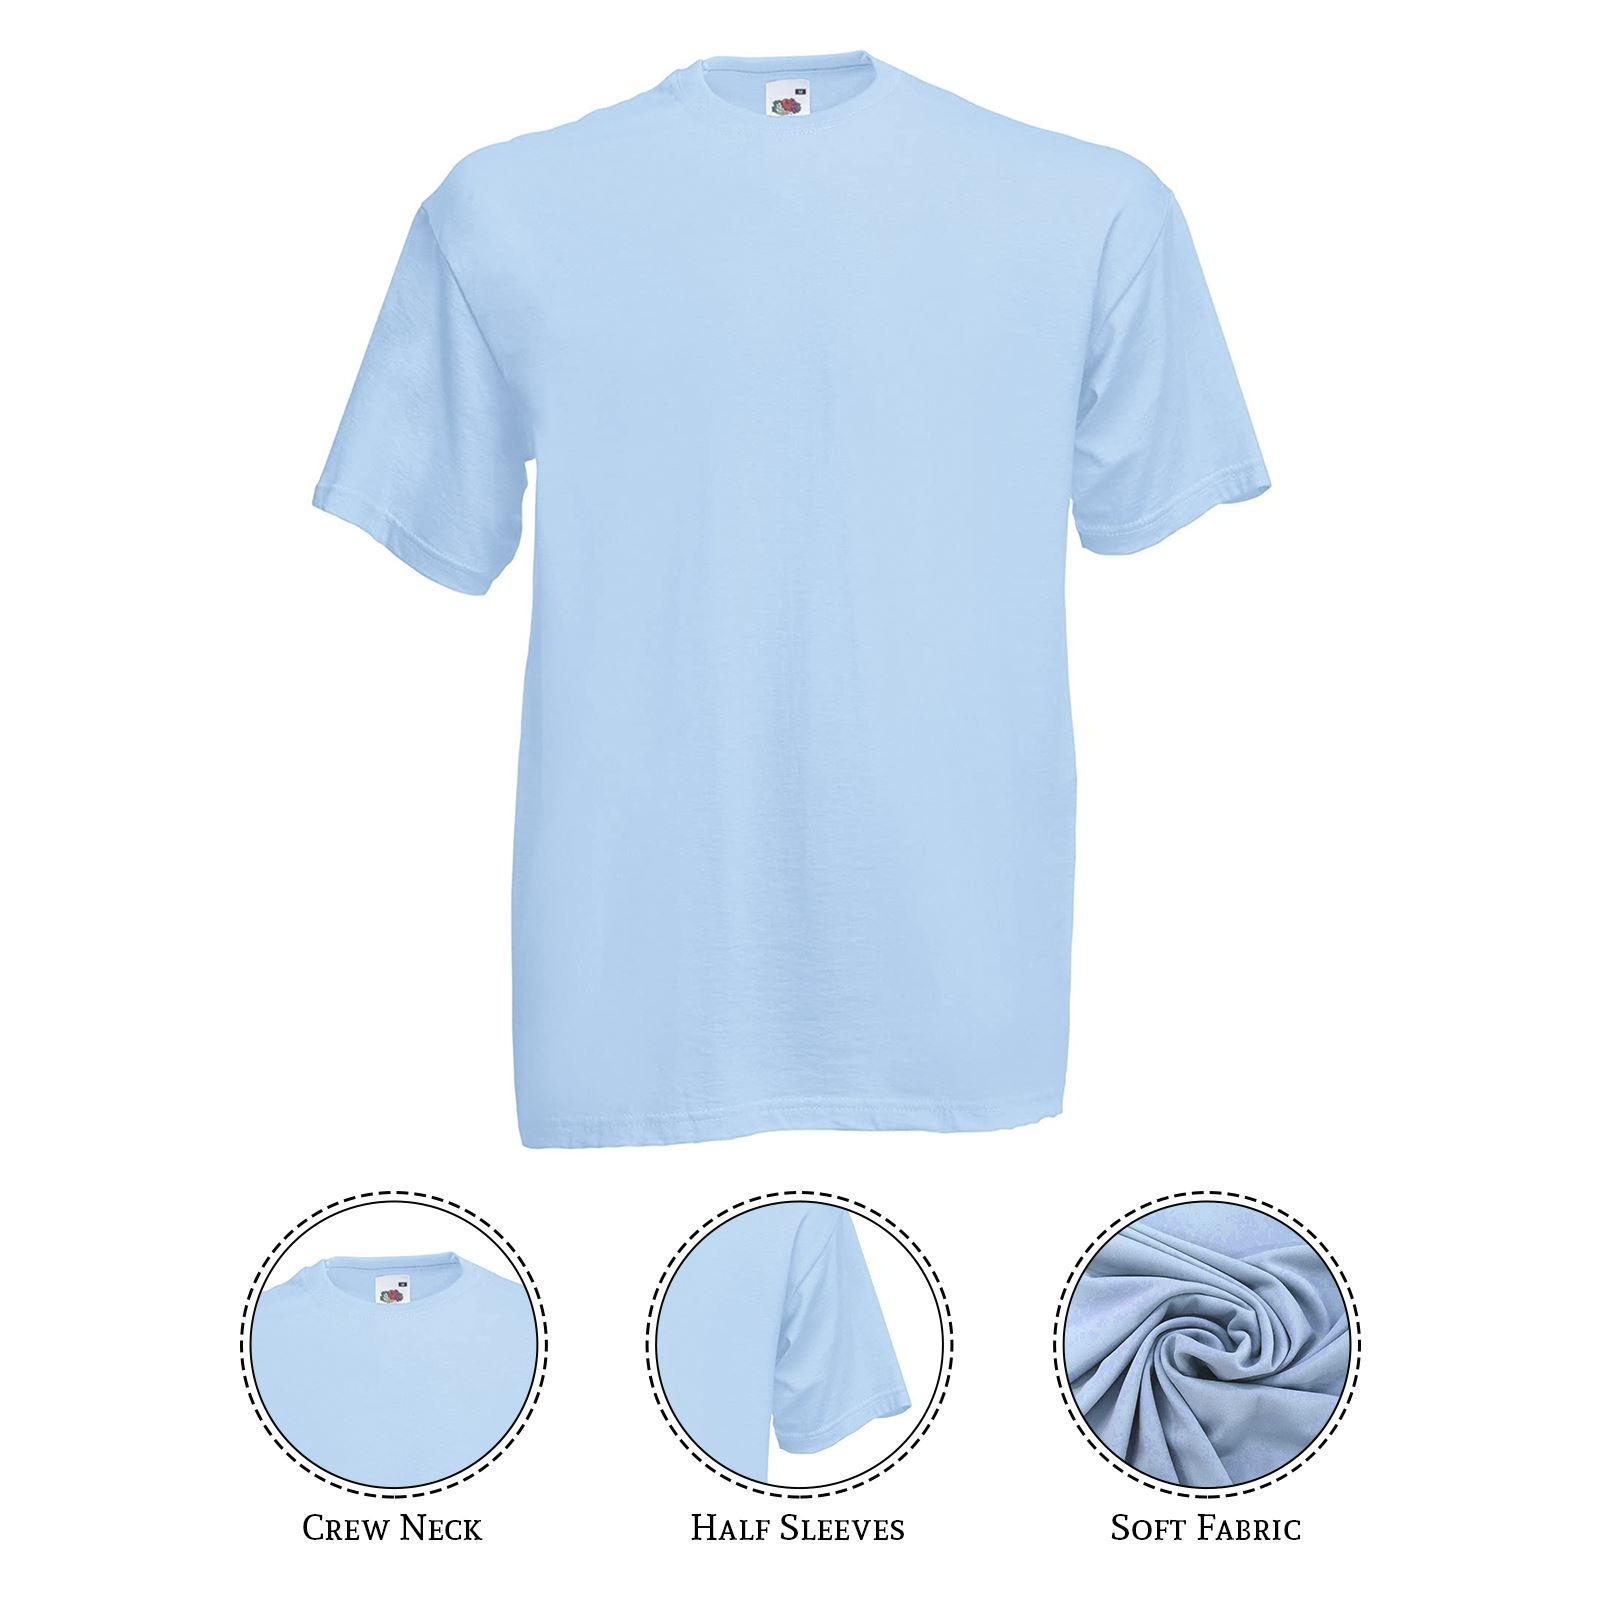 thumbnail 25 - Men-s-Fruit-Of-The-Loom-T-Shirt-Original-100-Cotton-Casual-Plain-Top-Tee